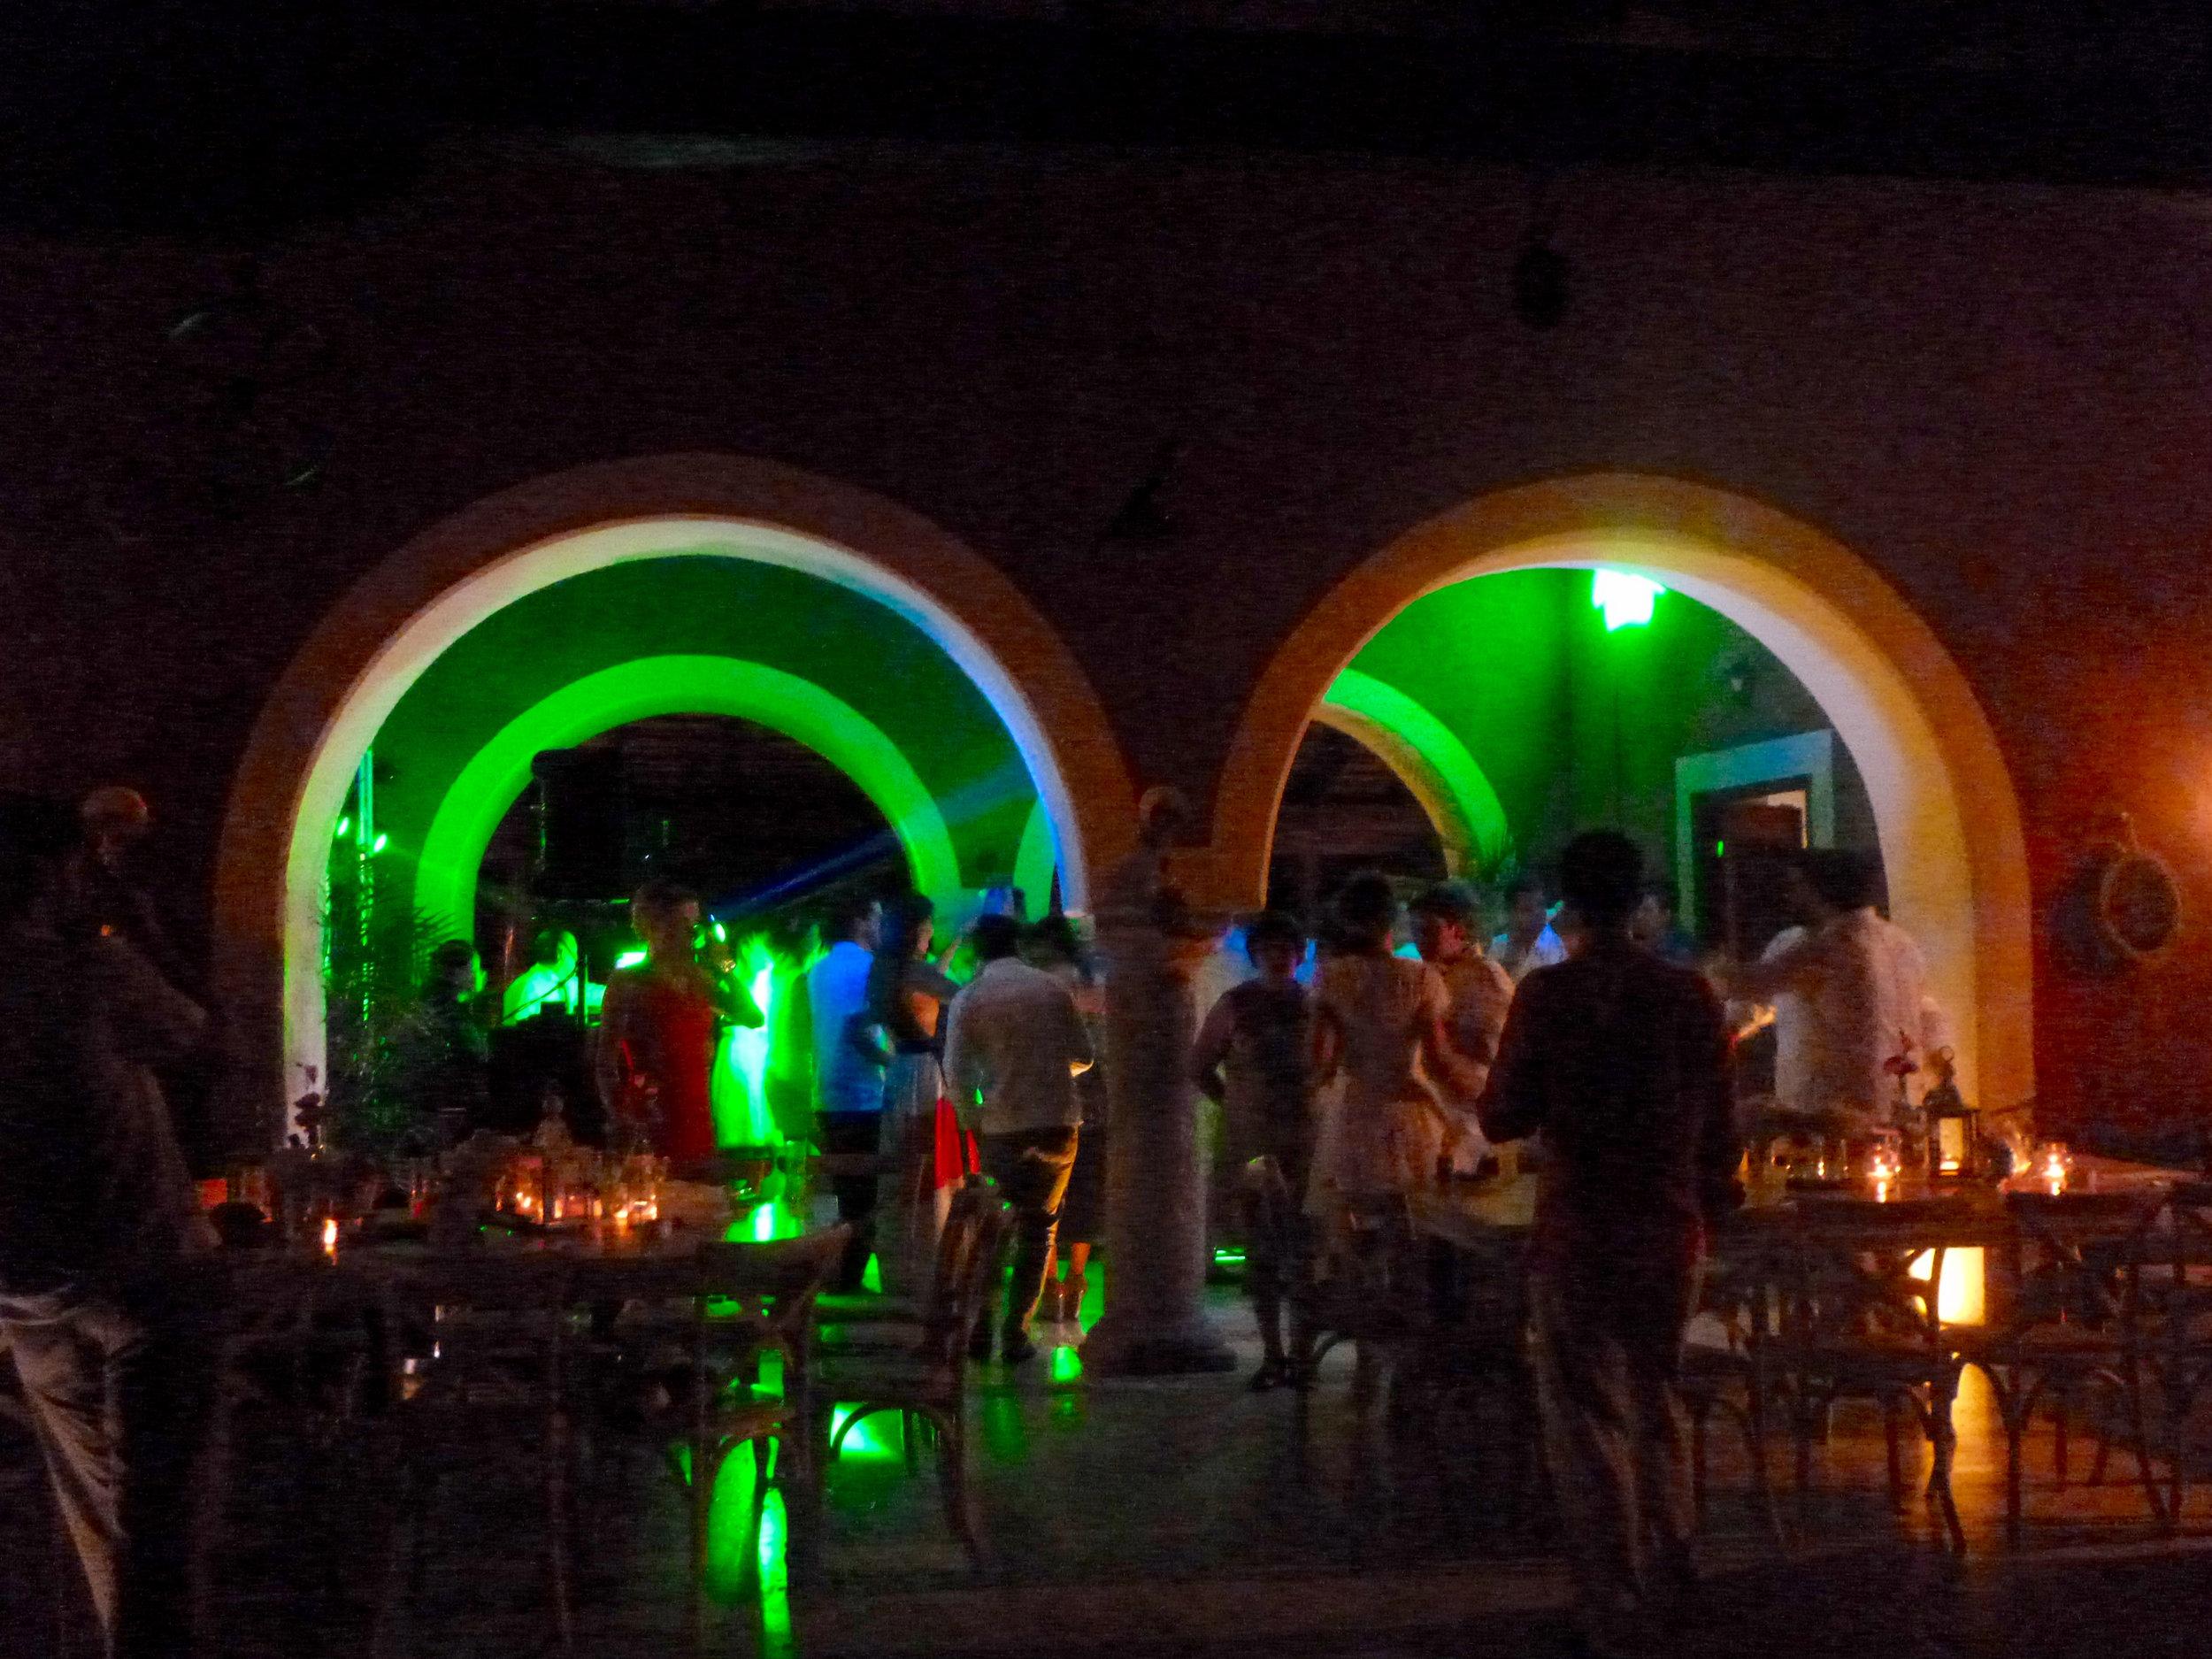 Arches dancefloor - 3.jpg